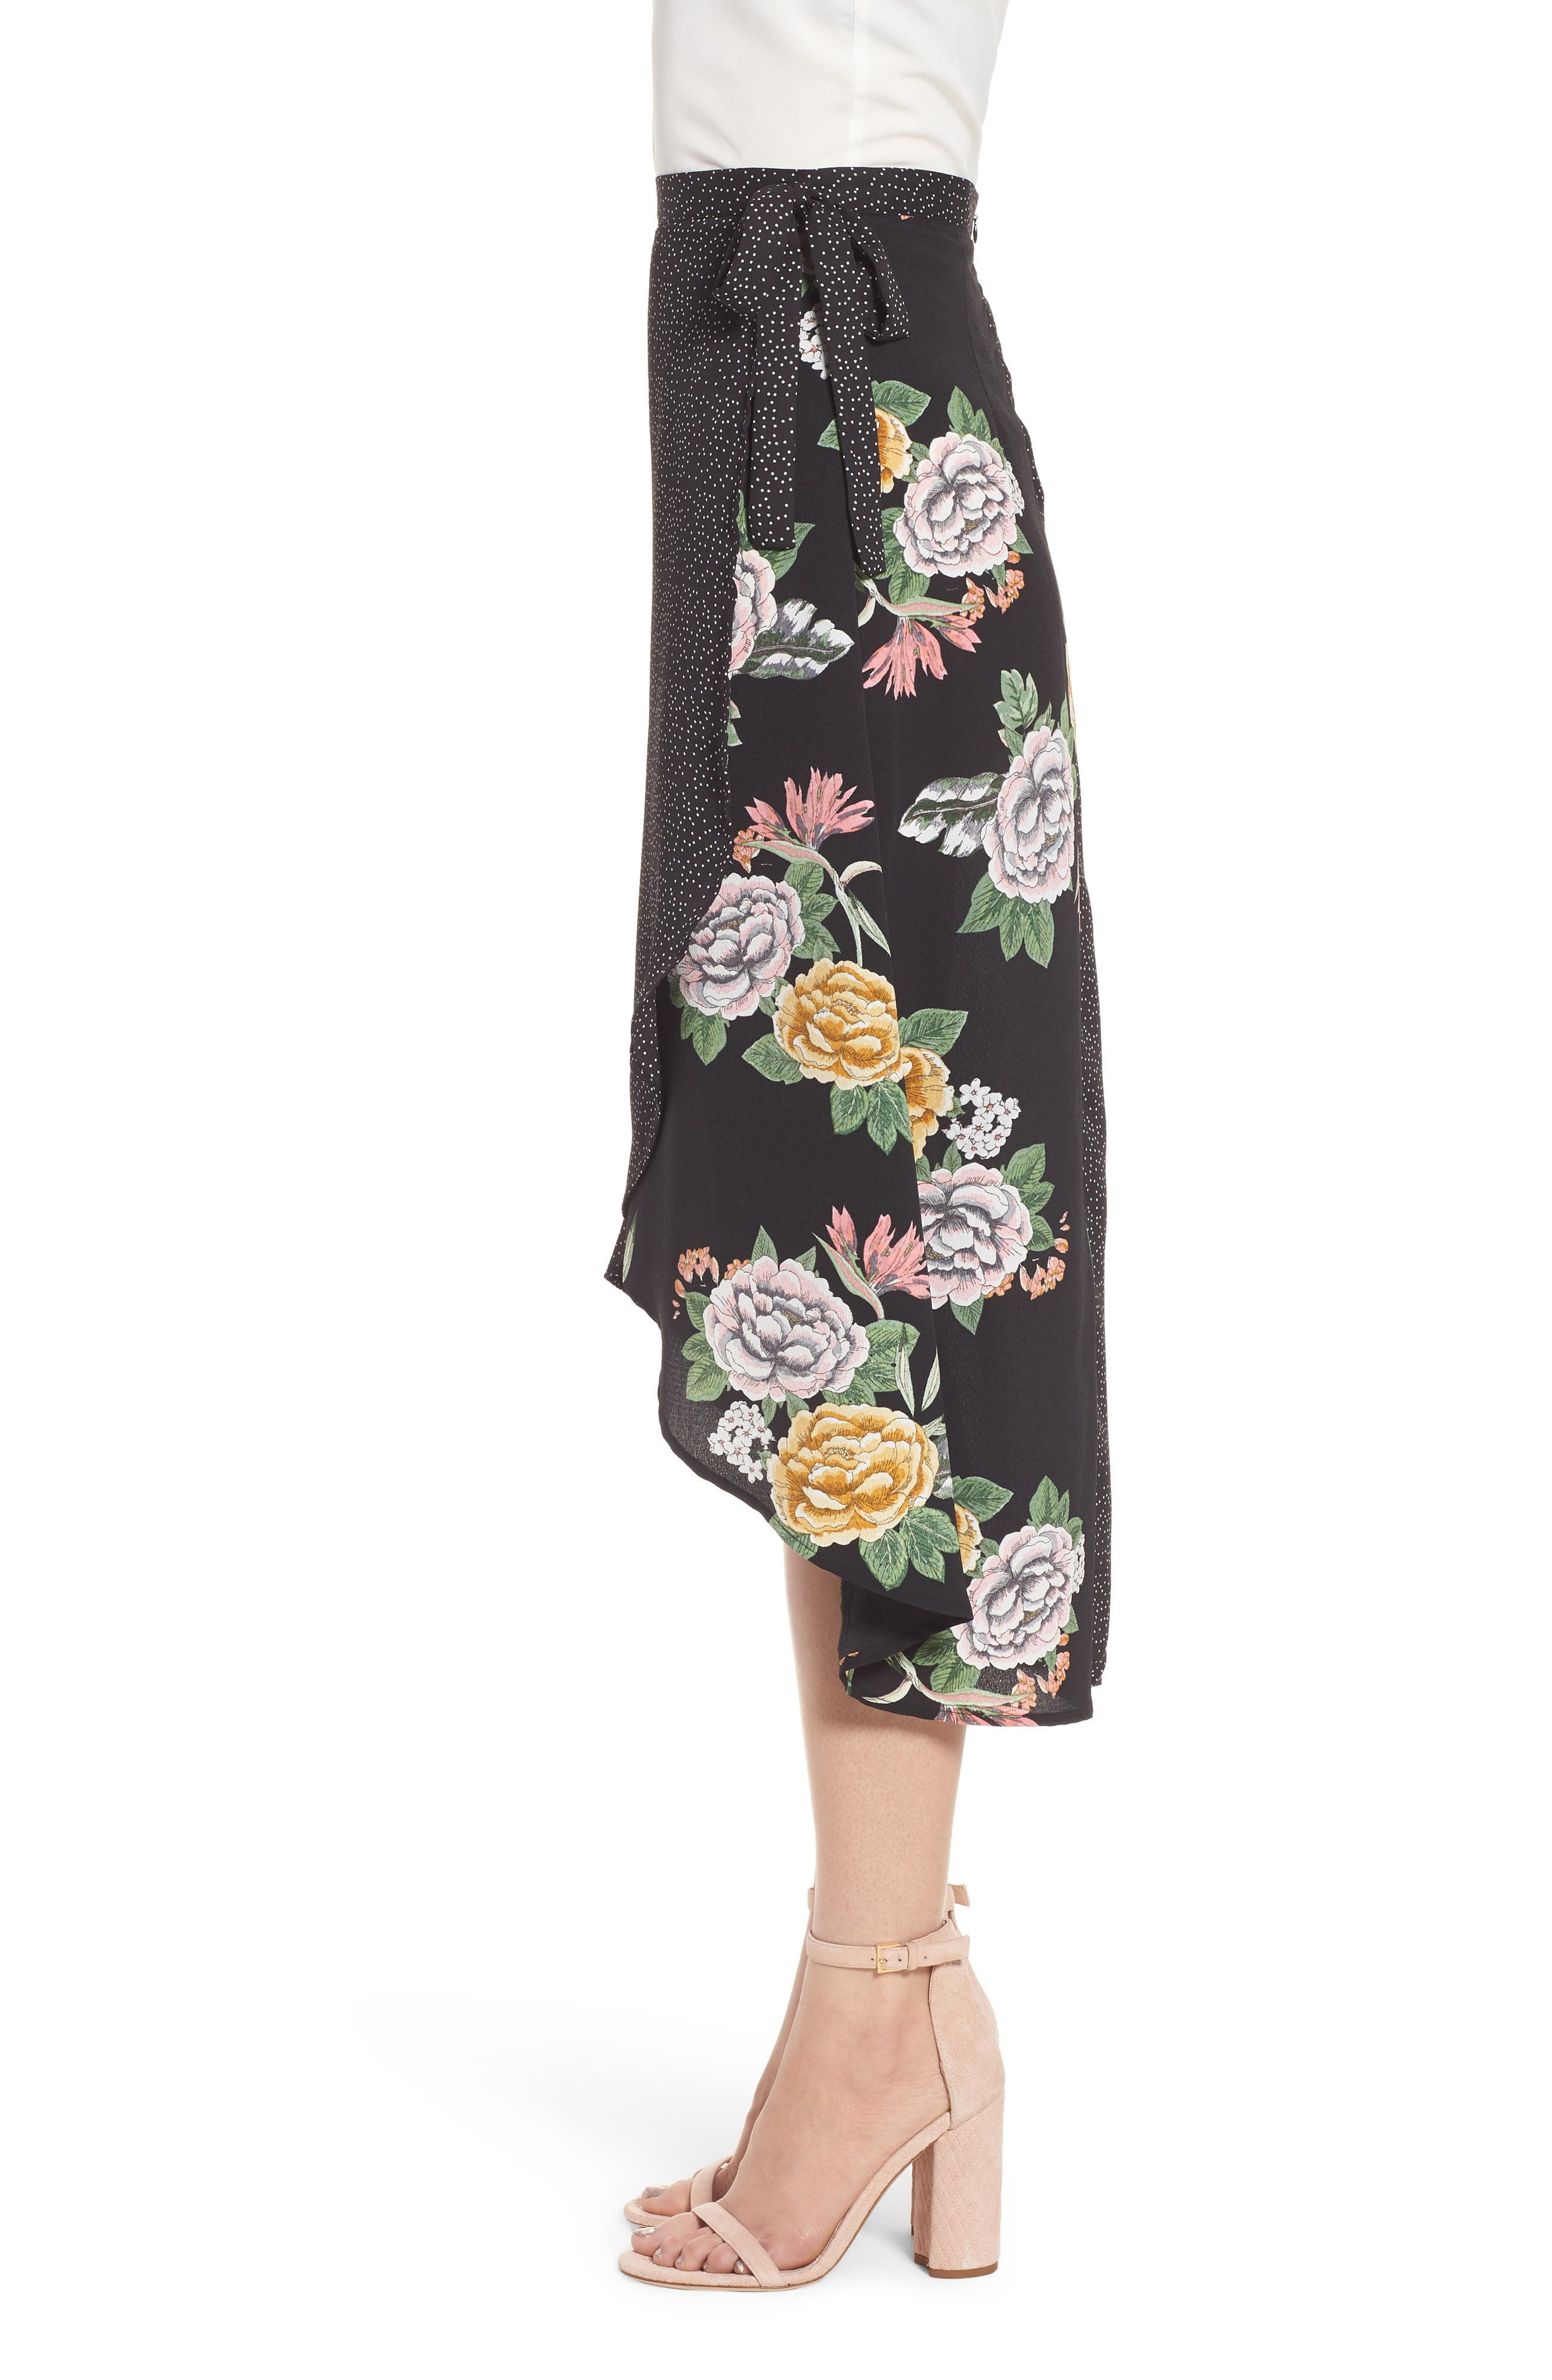 Bishop + Young Enchanted Garden Mix Media Skirt,                             Alternate thumbnail 3, color,                             Enchanted Garden Print